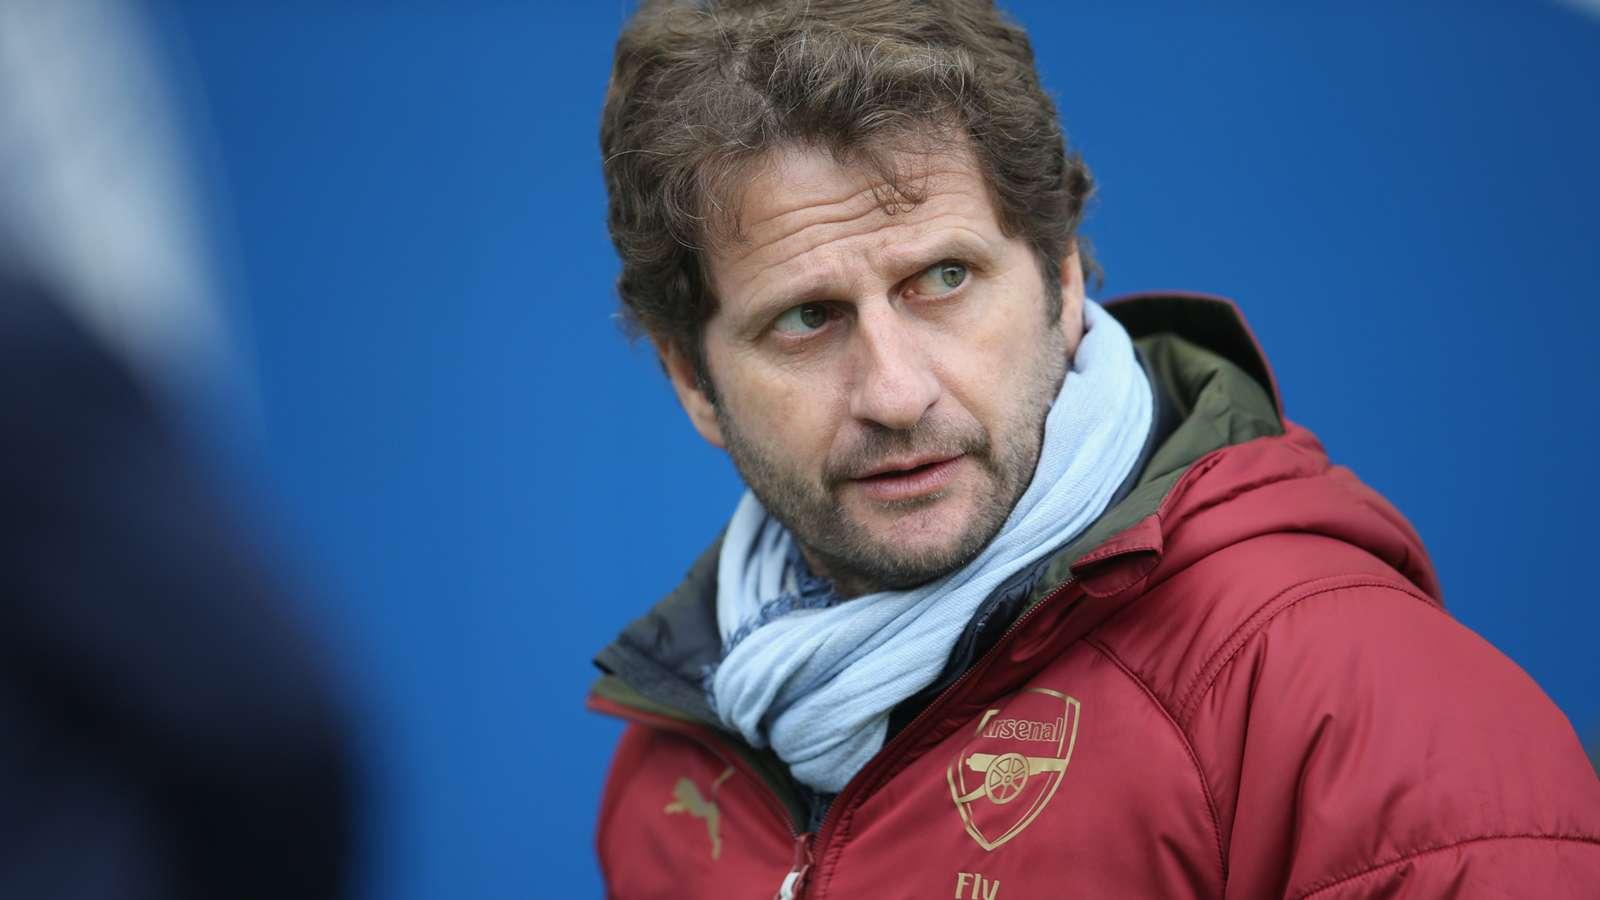 'I thought it was a joke!' - Joe Montemurro on The Best FIFA nomination, coaching Arsenal and Warren Joyce - Bóng Đá